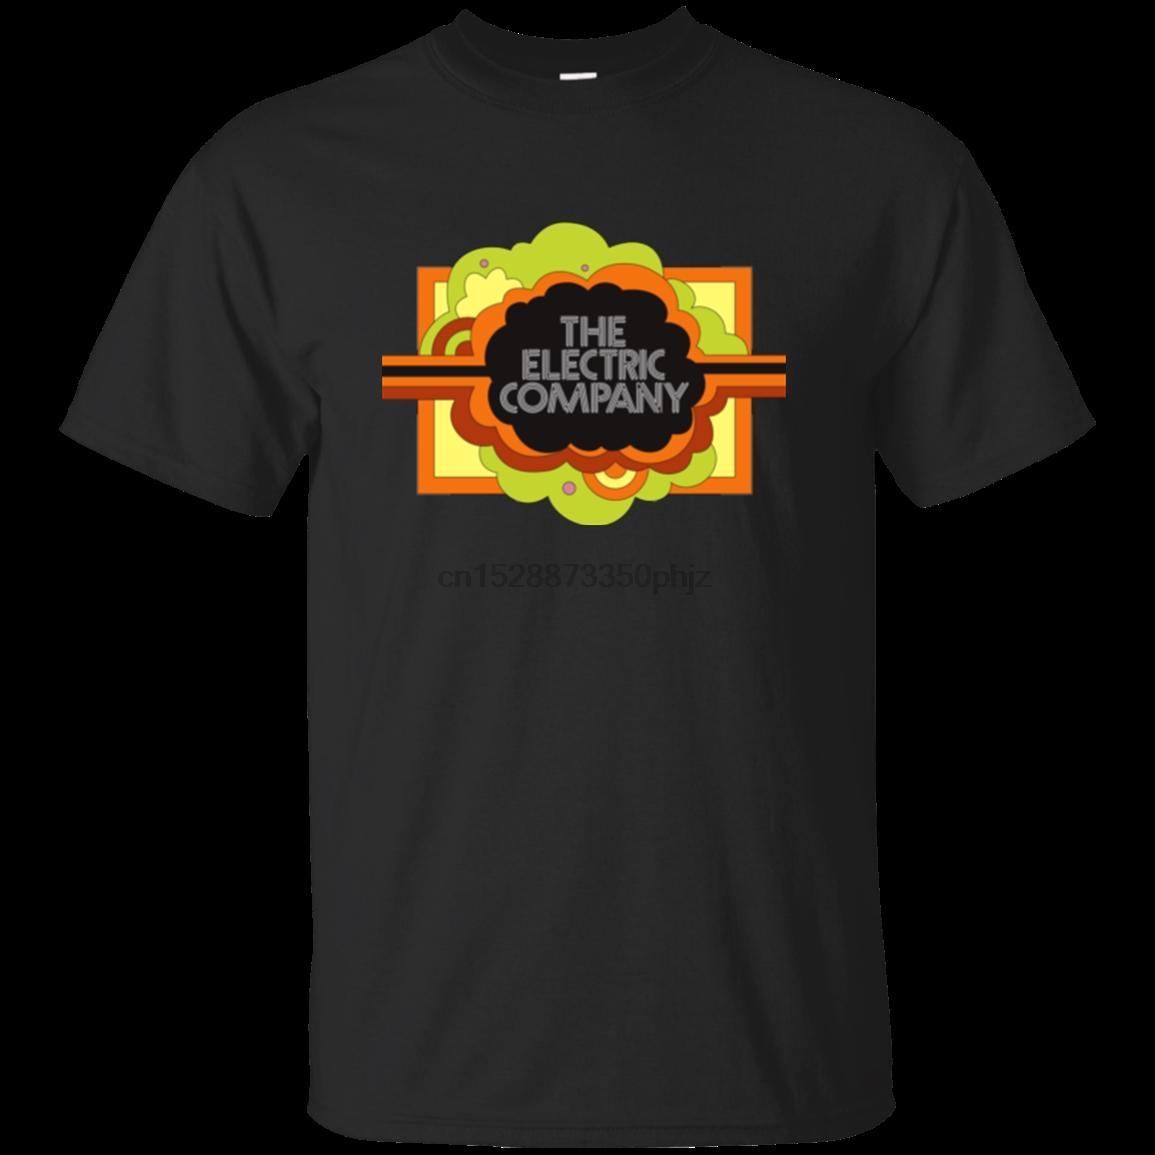 Elektrik Şirketi Retro Çocuk Televizyon Pbs 70T-Shirt Serin Unisex Pride Tişörtlü Erkekler Rasgele Tshirt Ücretsiz Moda